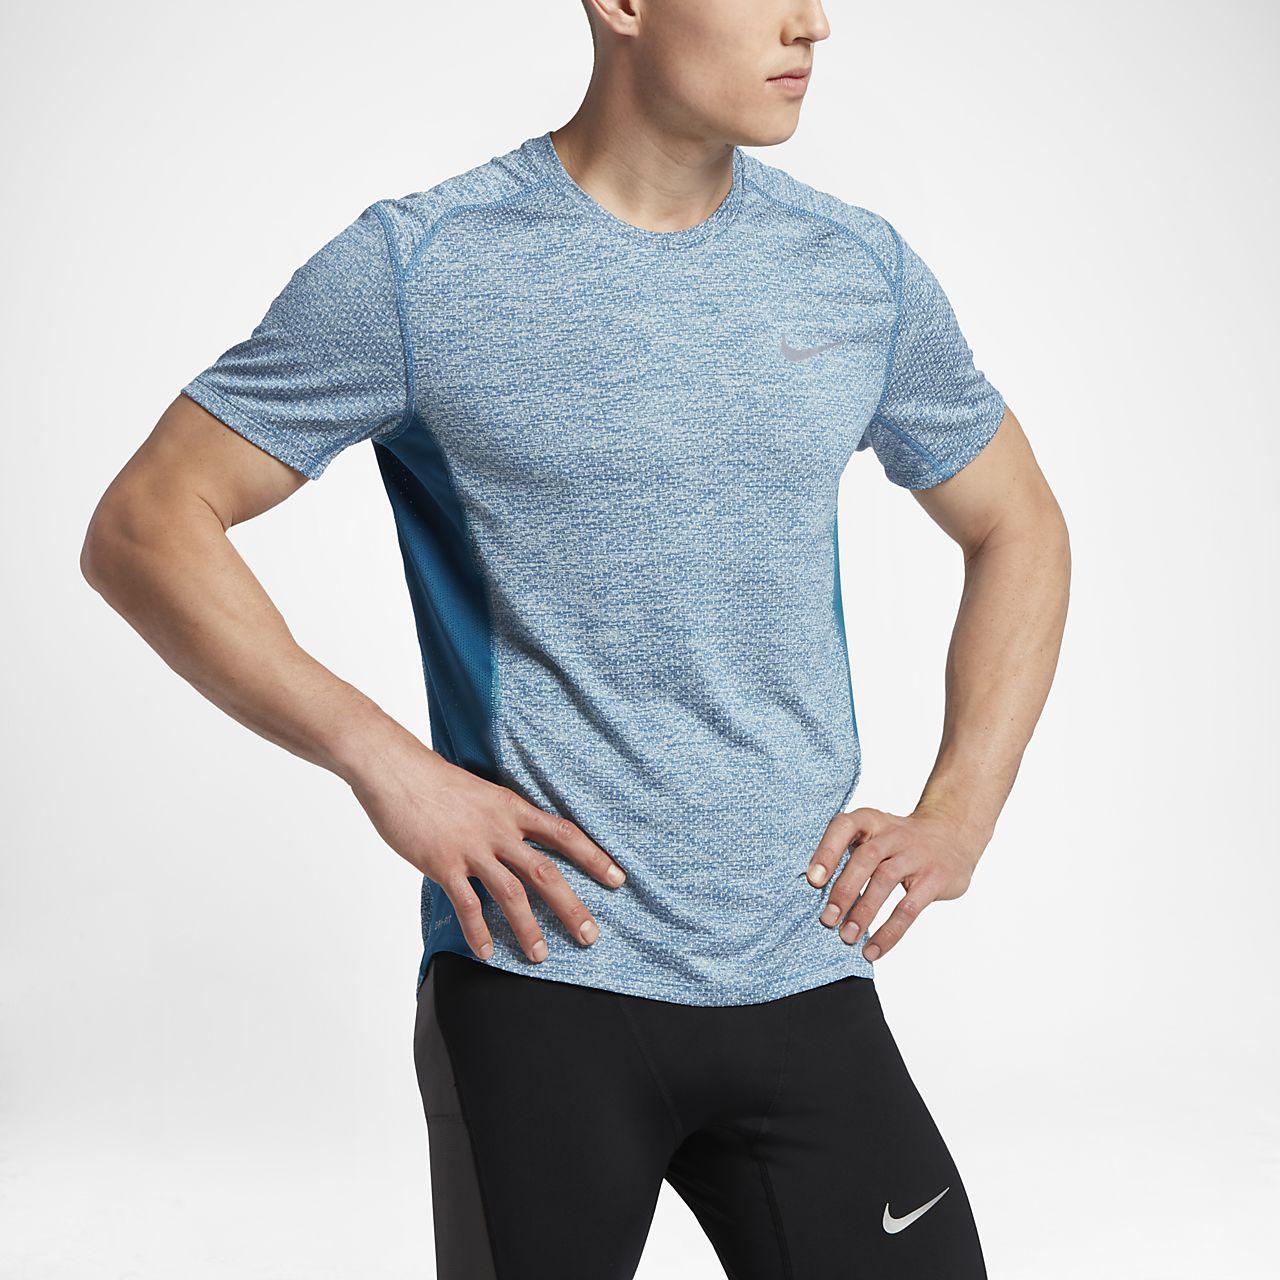 Nike Breathe Miler Cool Men's Short-Sleeve Running Top